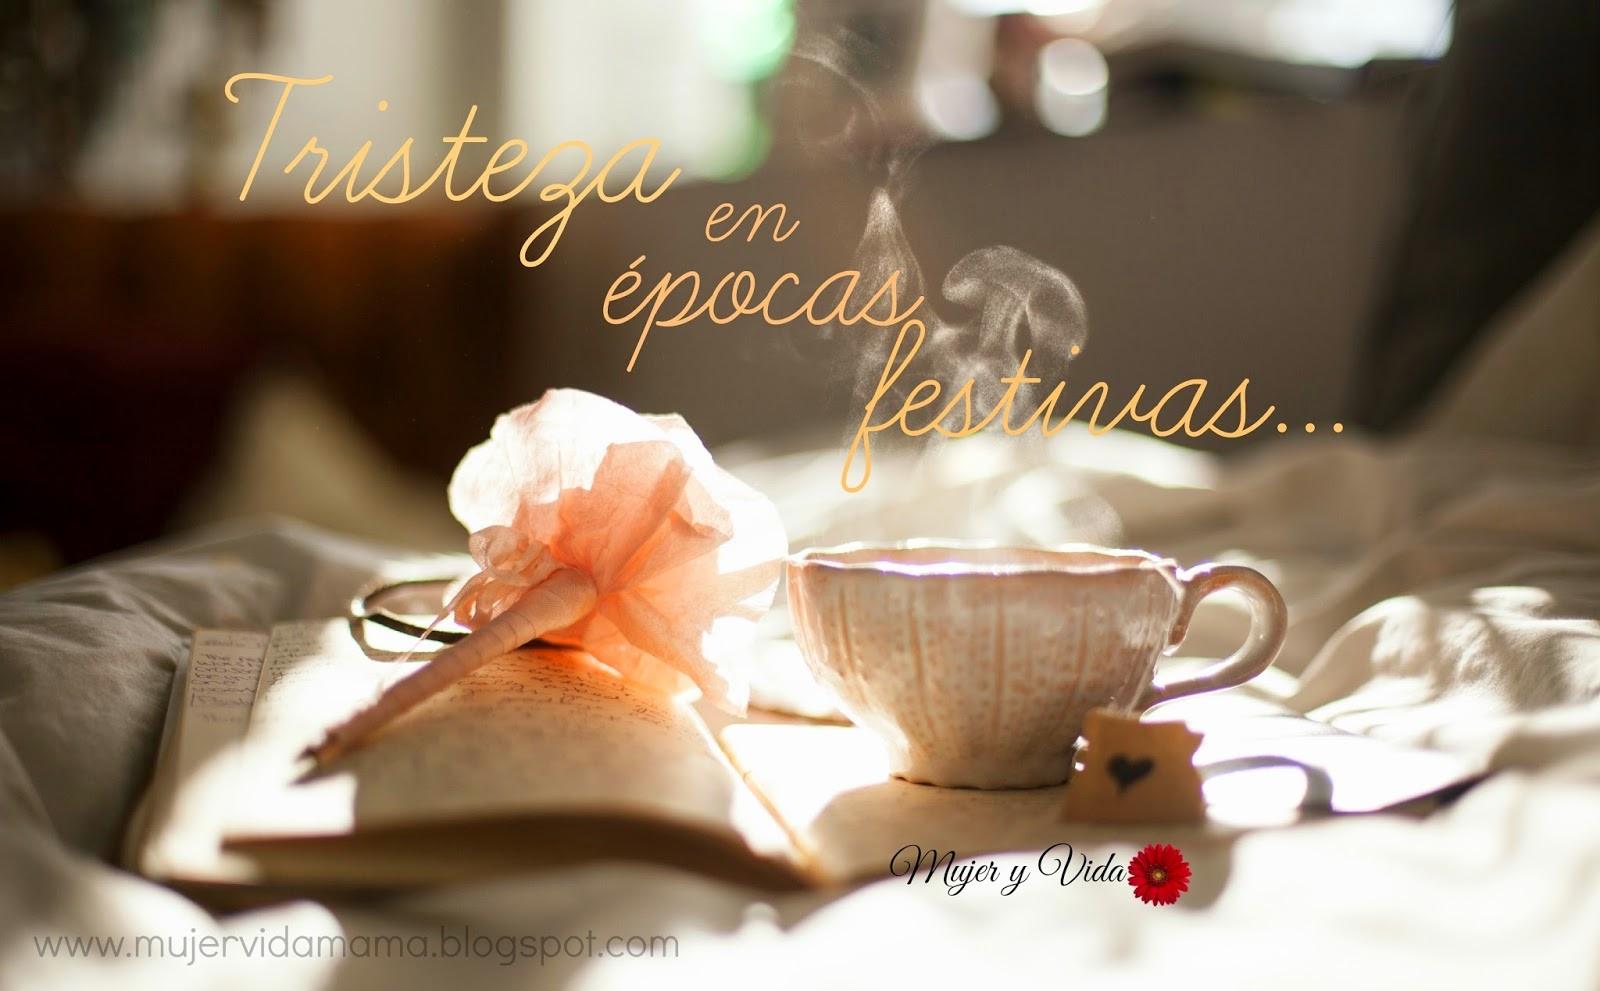 http://www.mujervidamama.blogspot.com/2014/12/tristeza-en-epocas-festivas.html#gpluscomments